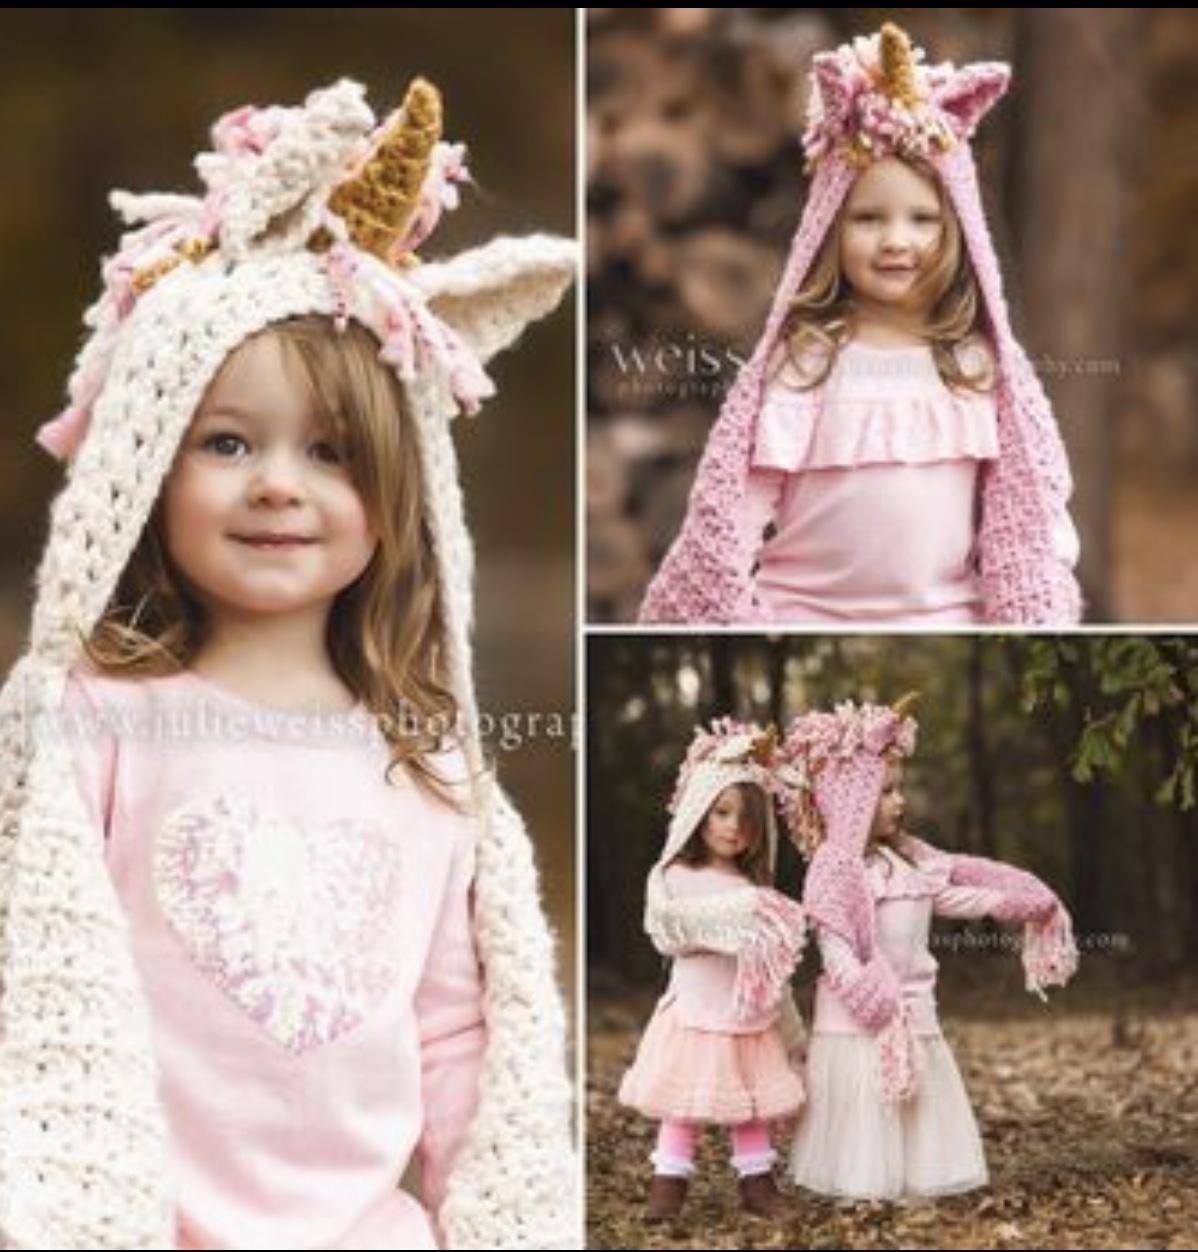 Unicorn Scarf, Hooded Baby Unicorn Gifts, Unicorn Birthday Gift Ideas, Gold Horn